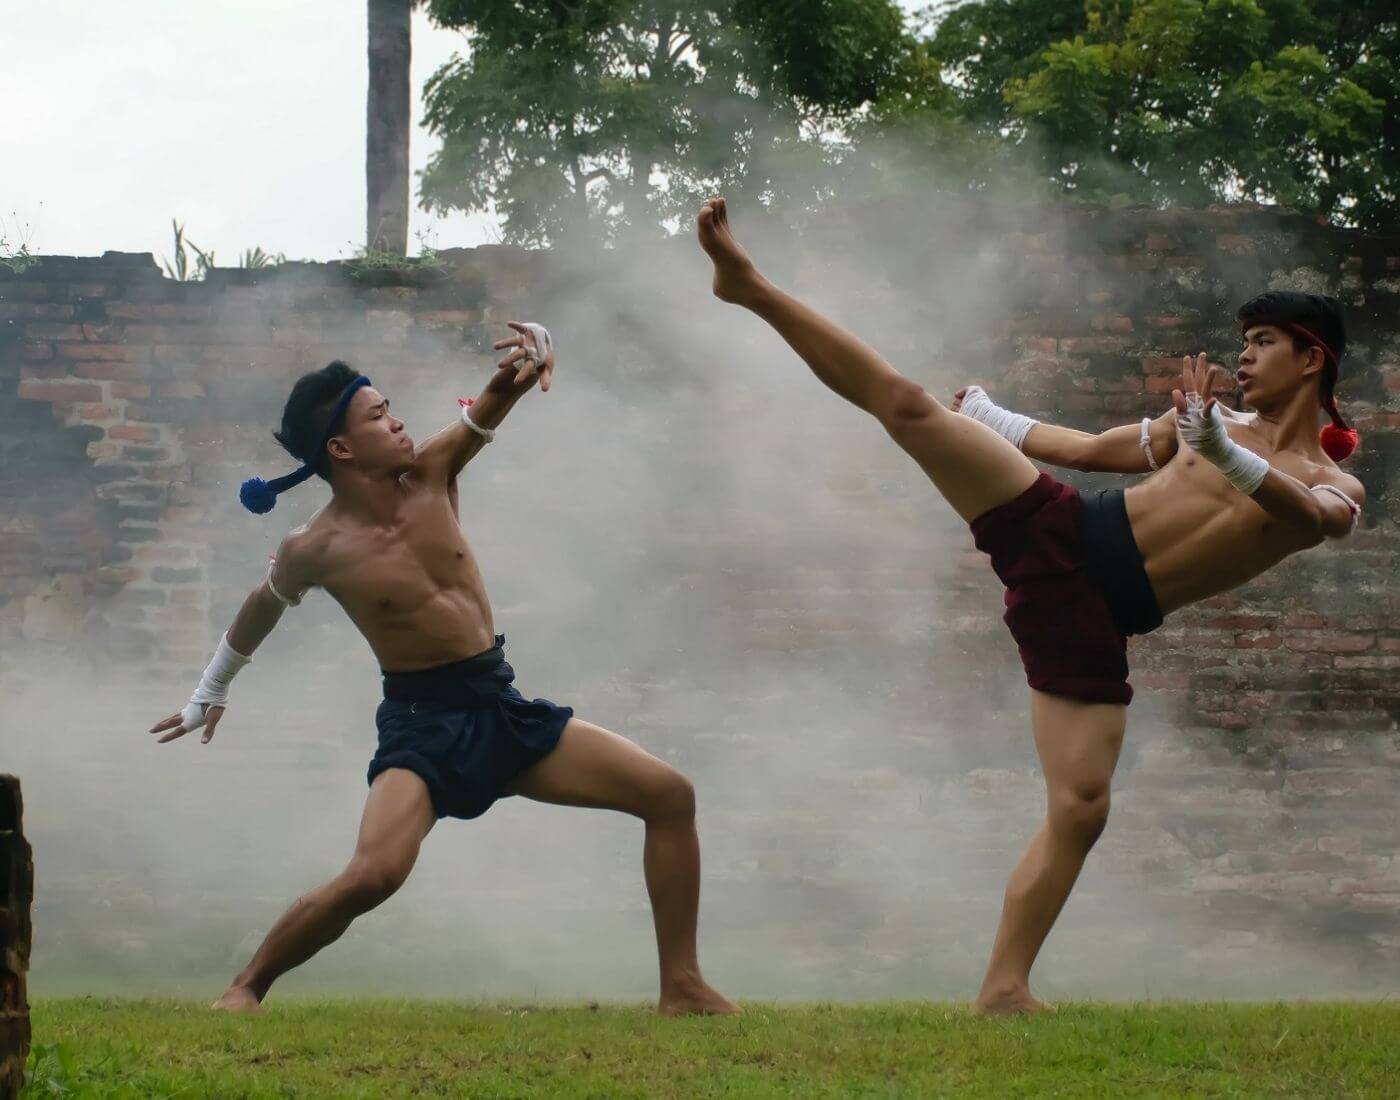 Muay Thai or Thai Boxing